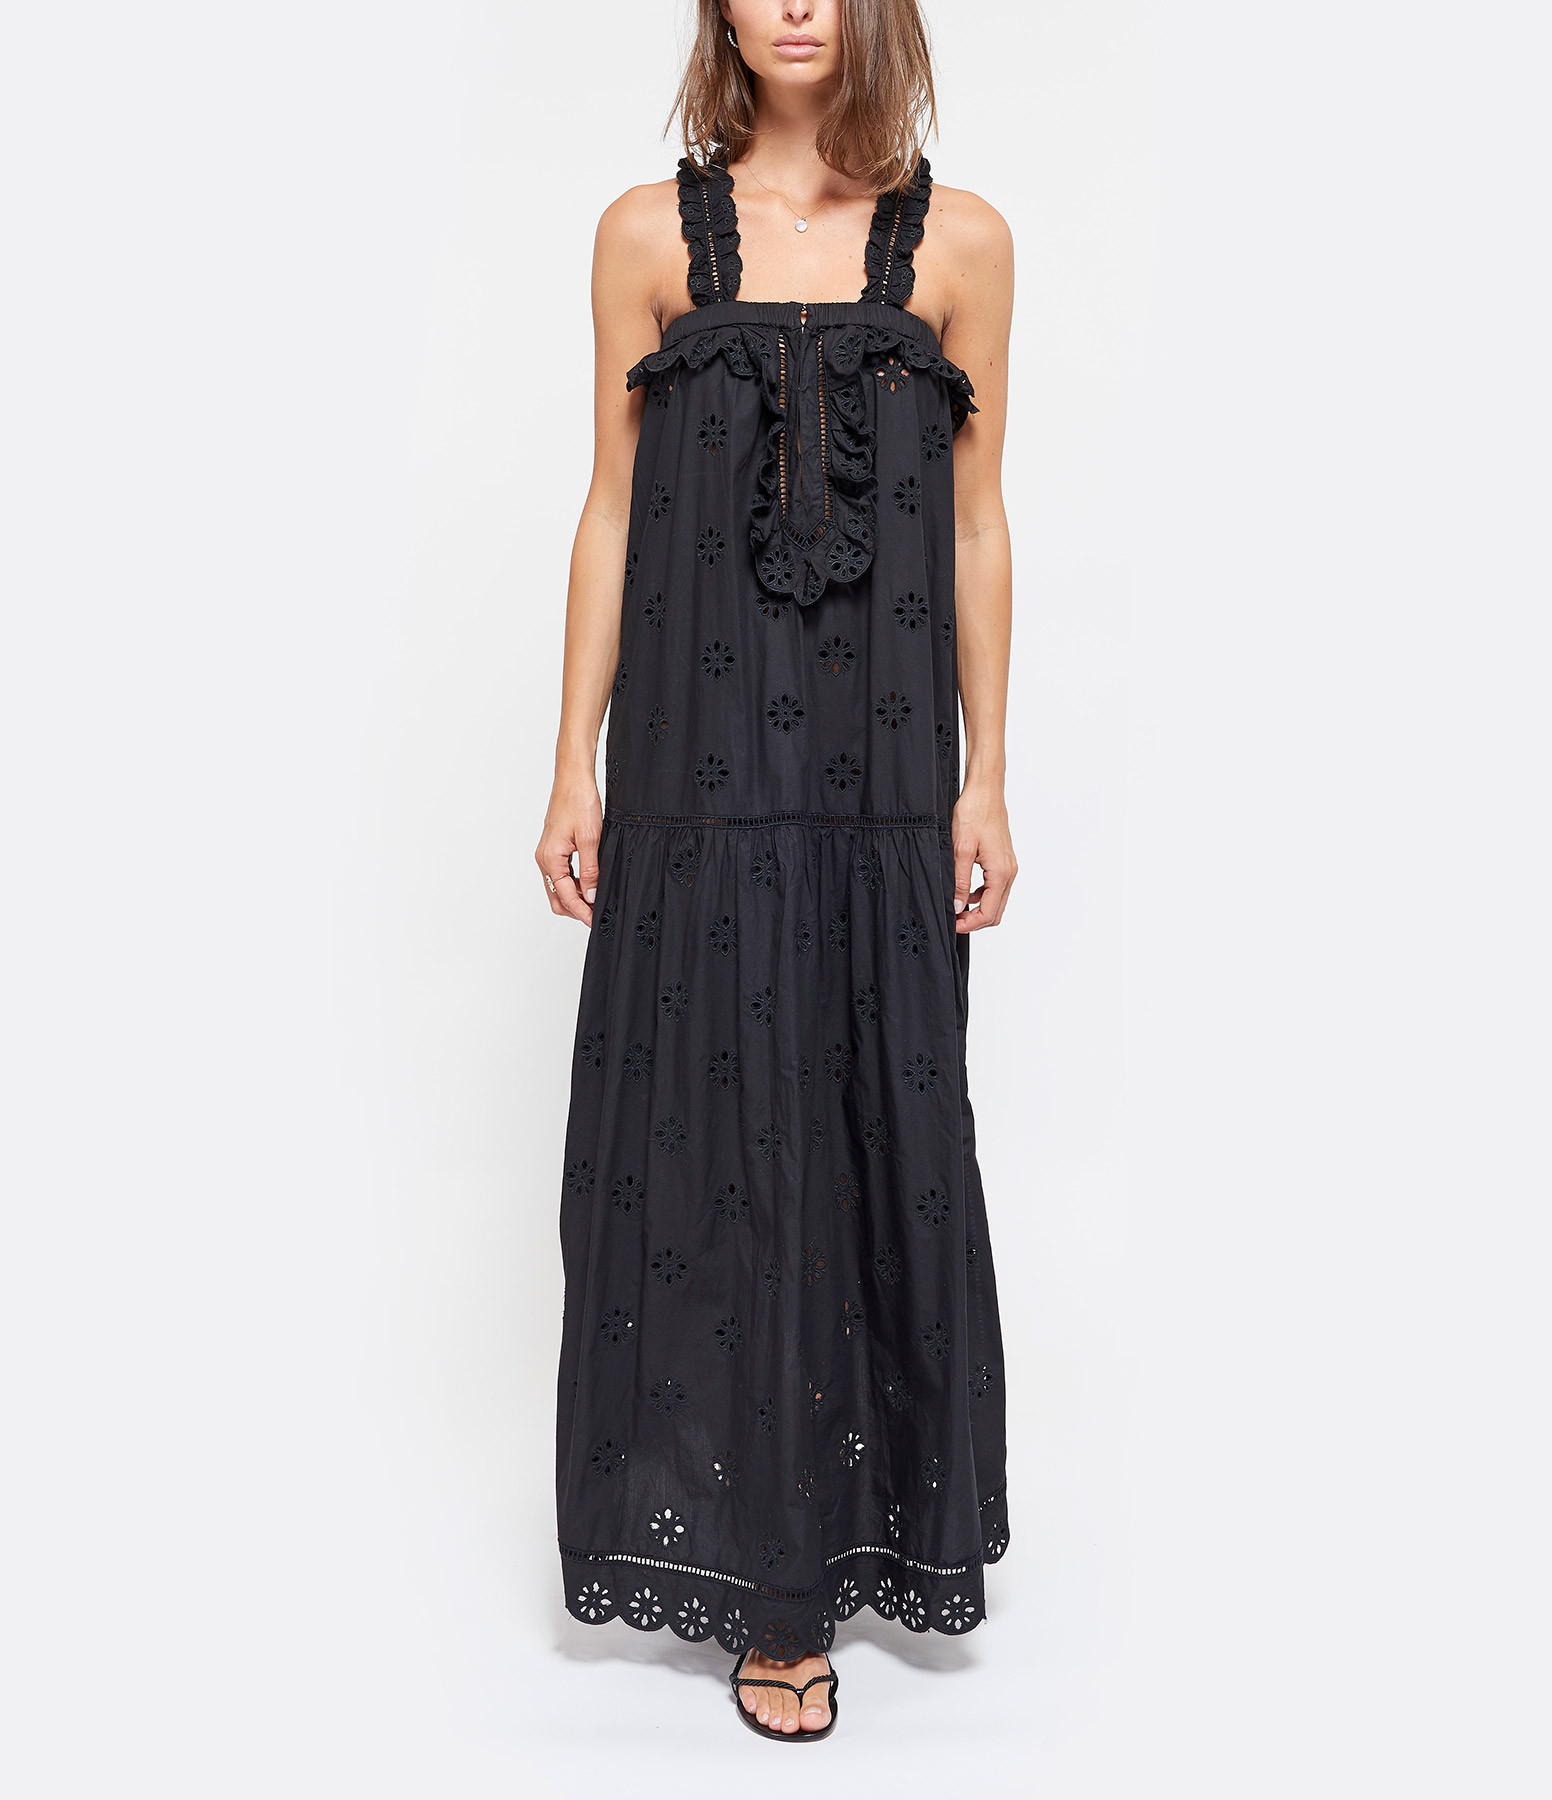 LAURENCE BRAS - Robe Miney Coton Noir